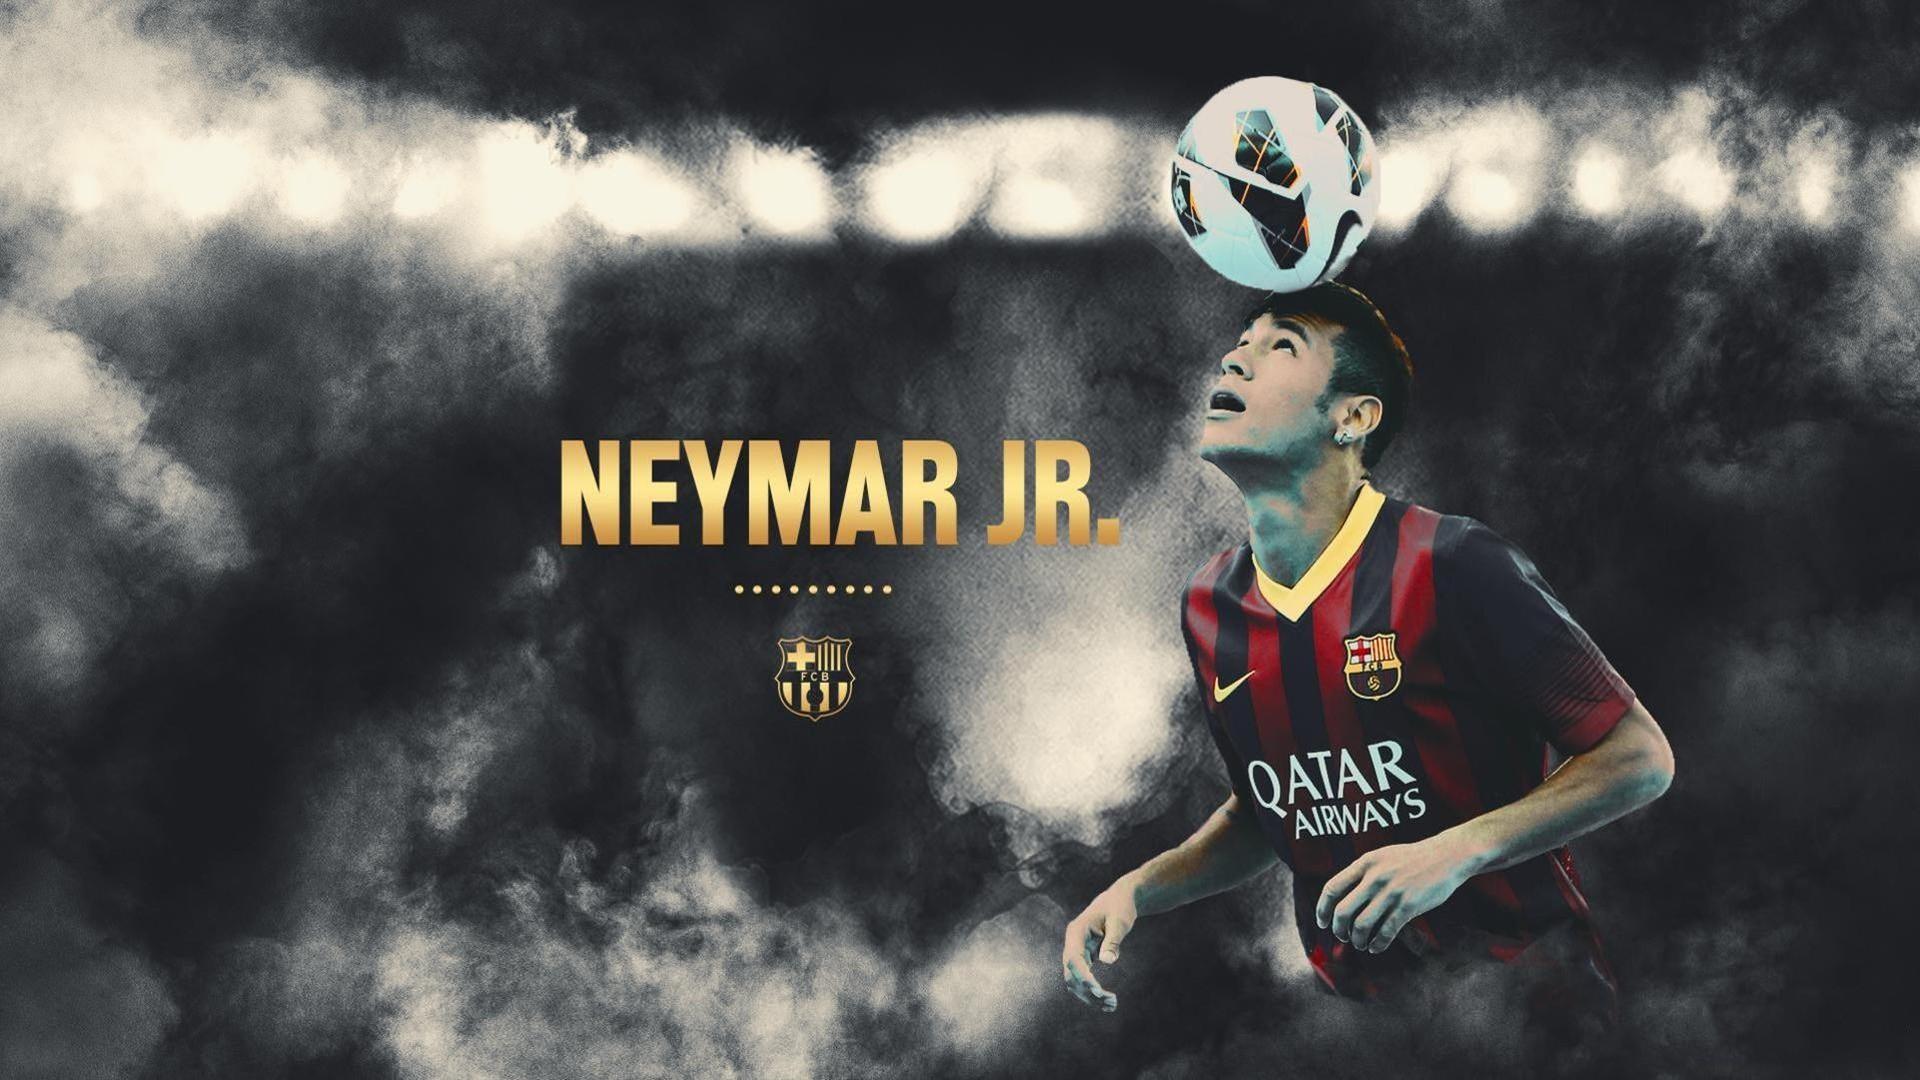 Neymar hd wallpaper download